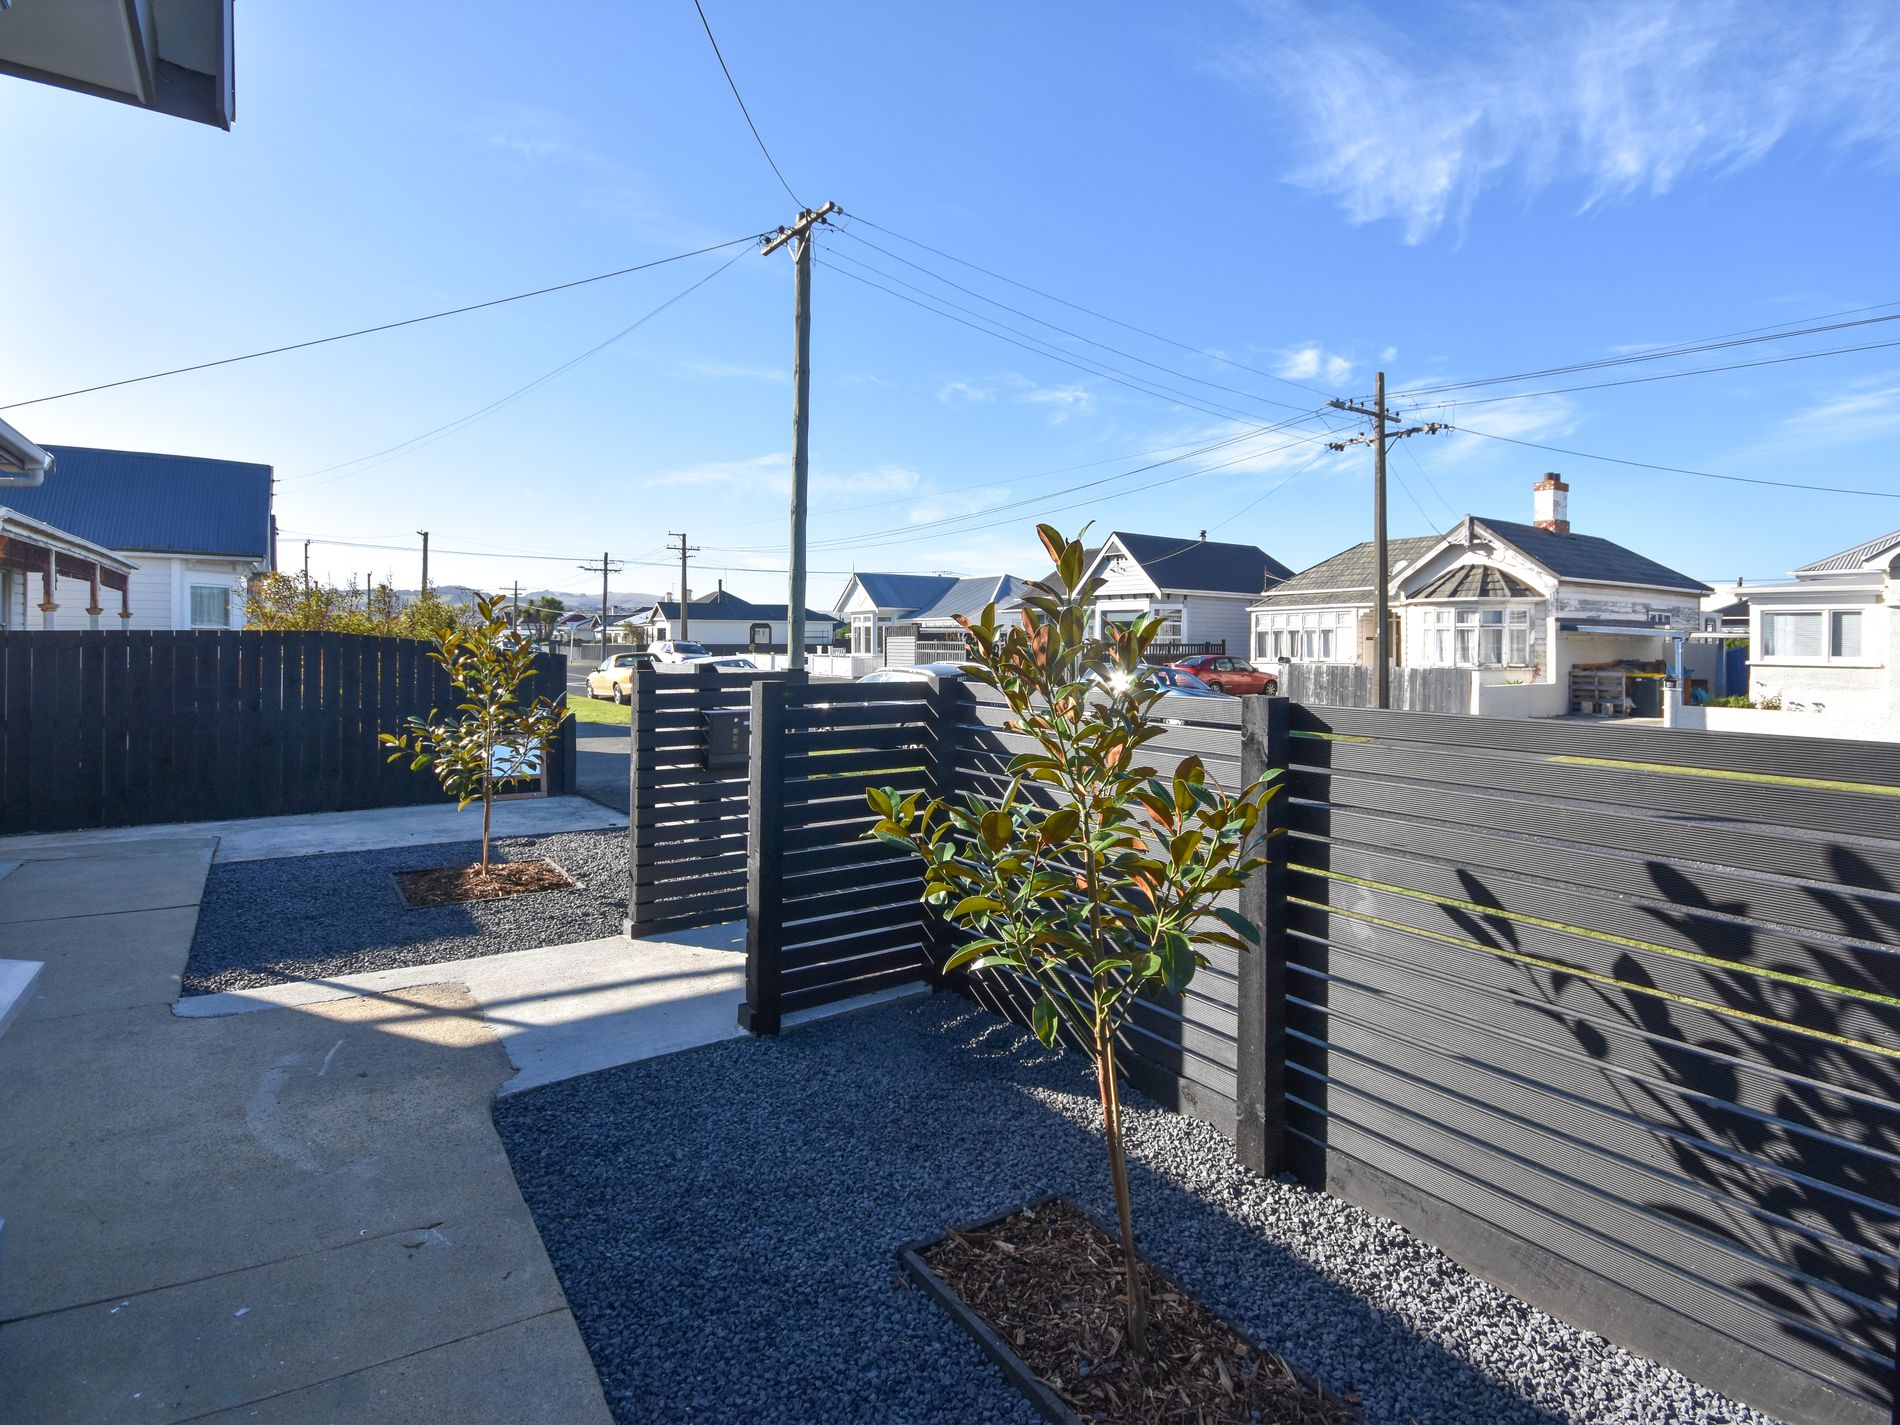 46 Douglas Street, Saint Kilda